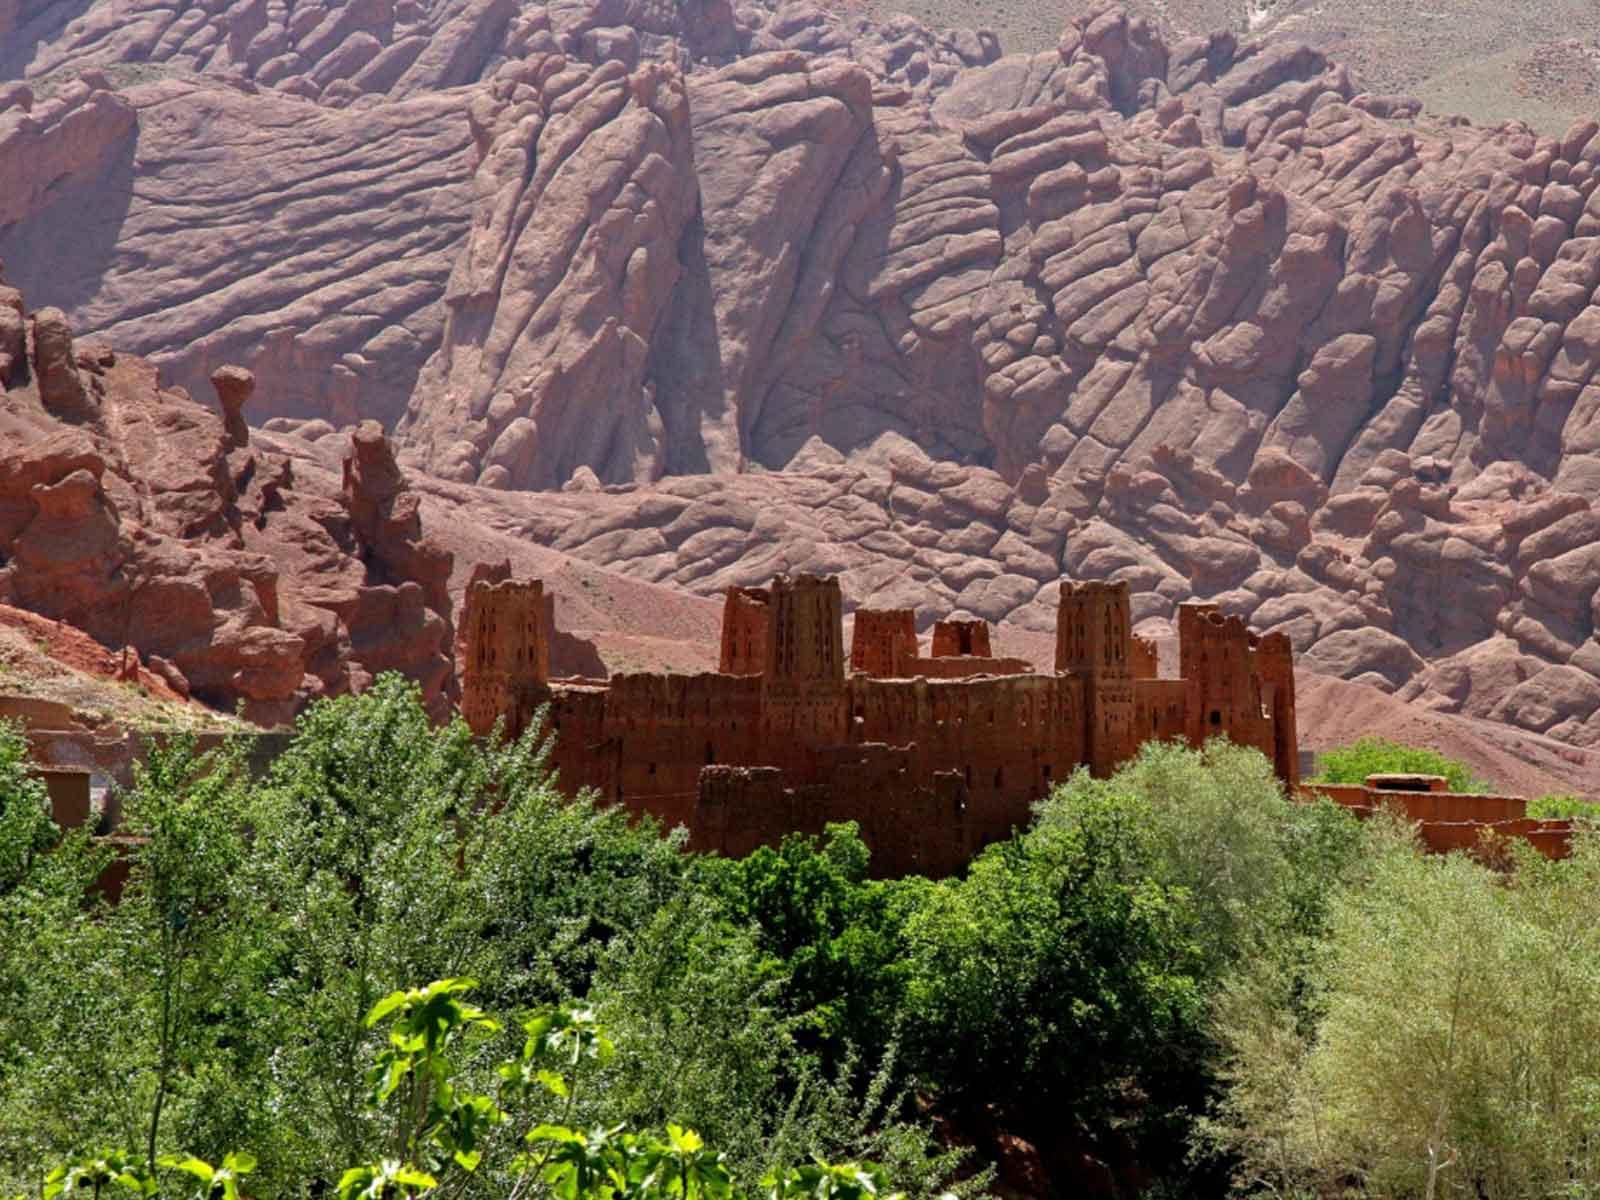 3 day Sahara desert trip from Marrakech to Fes